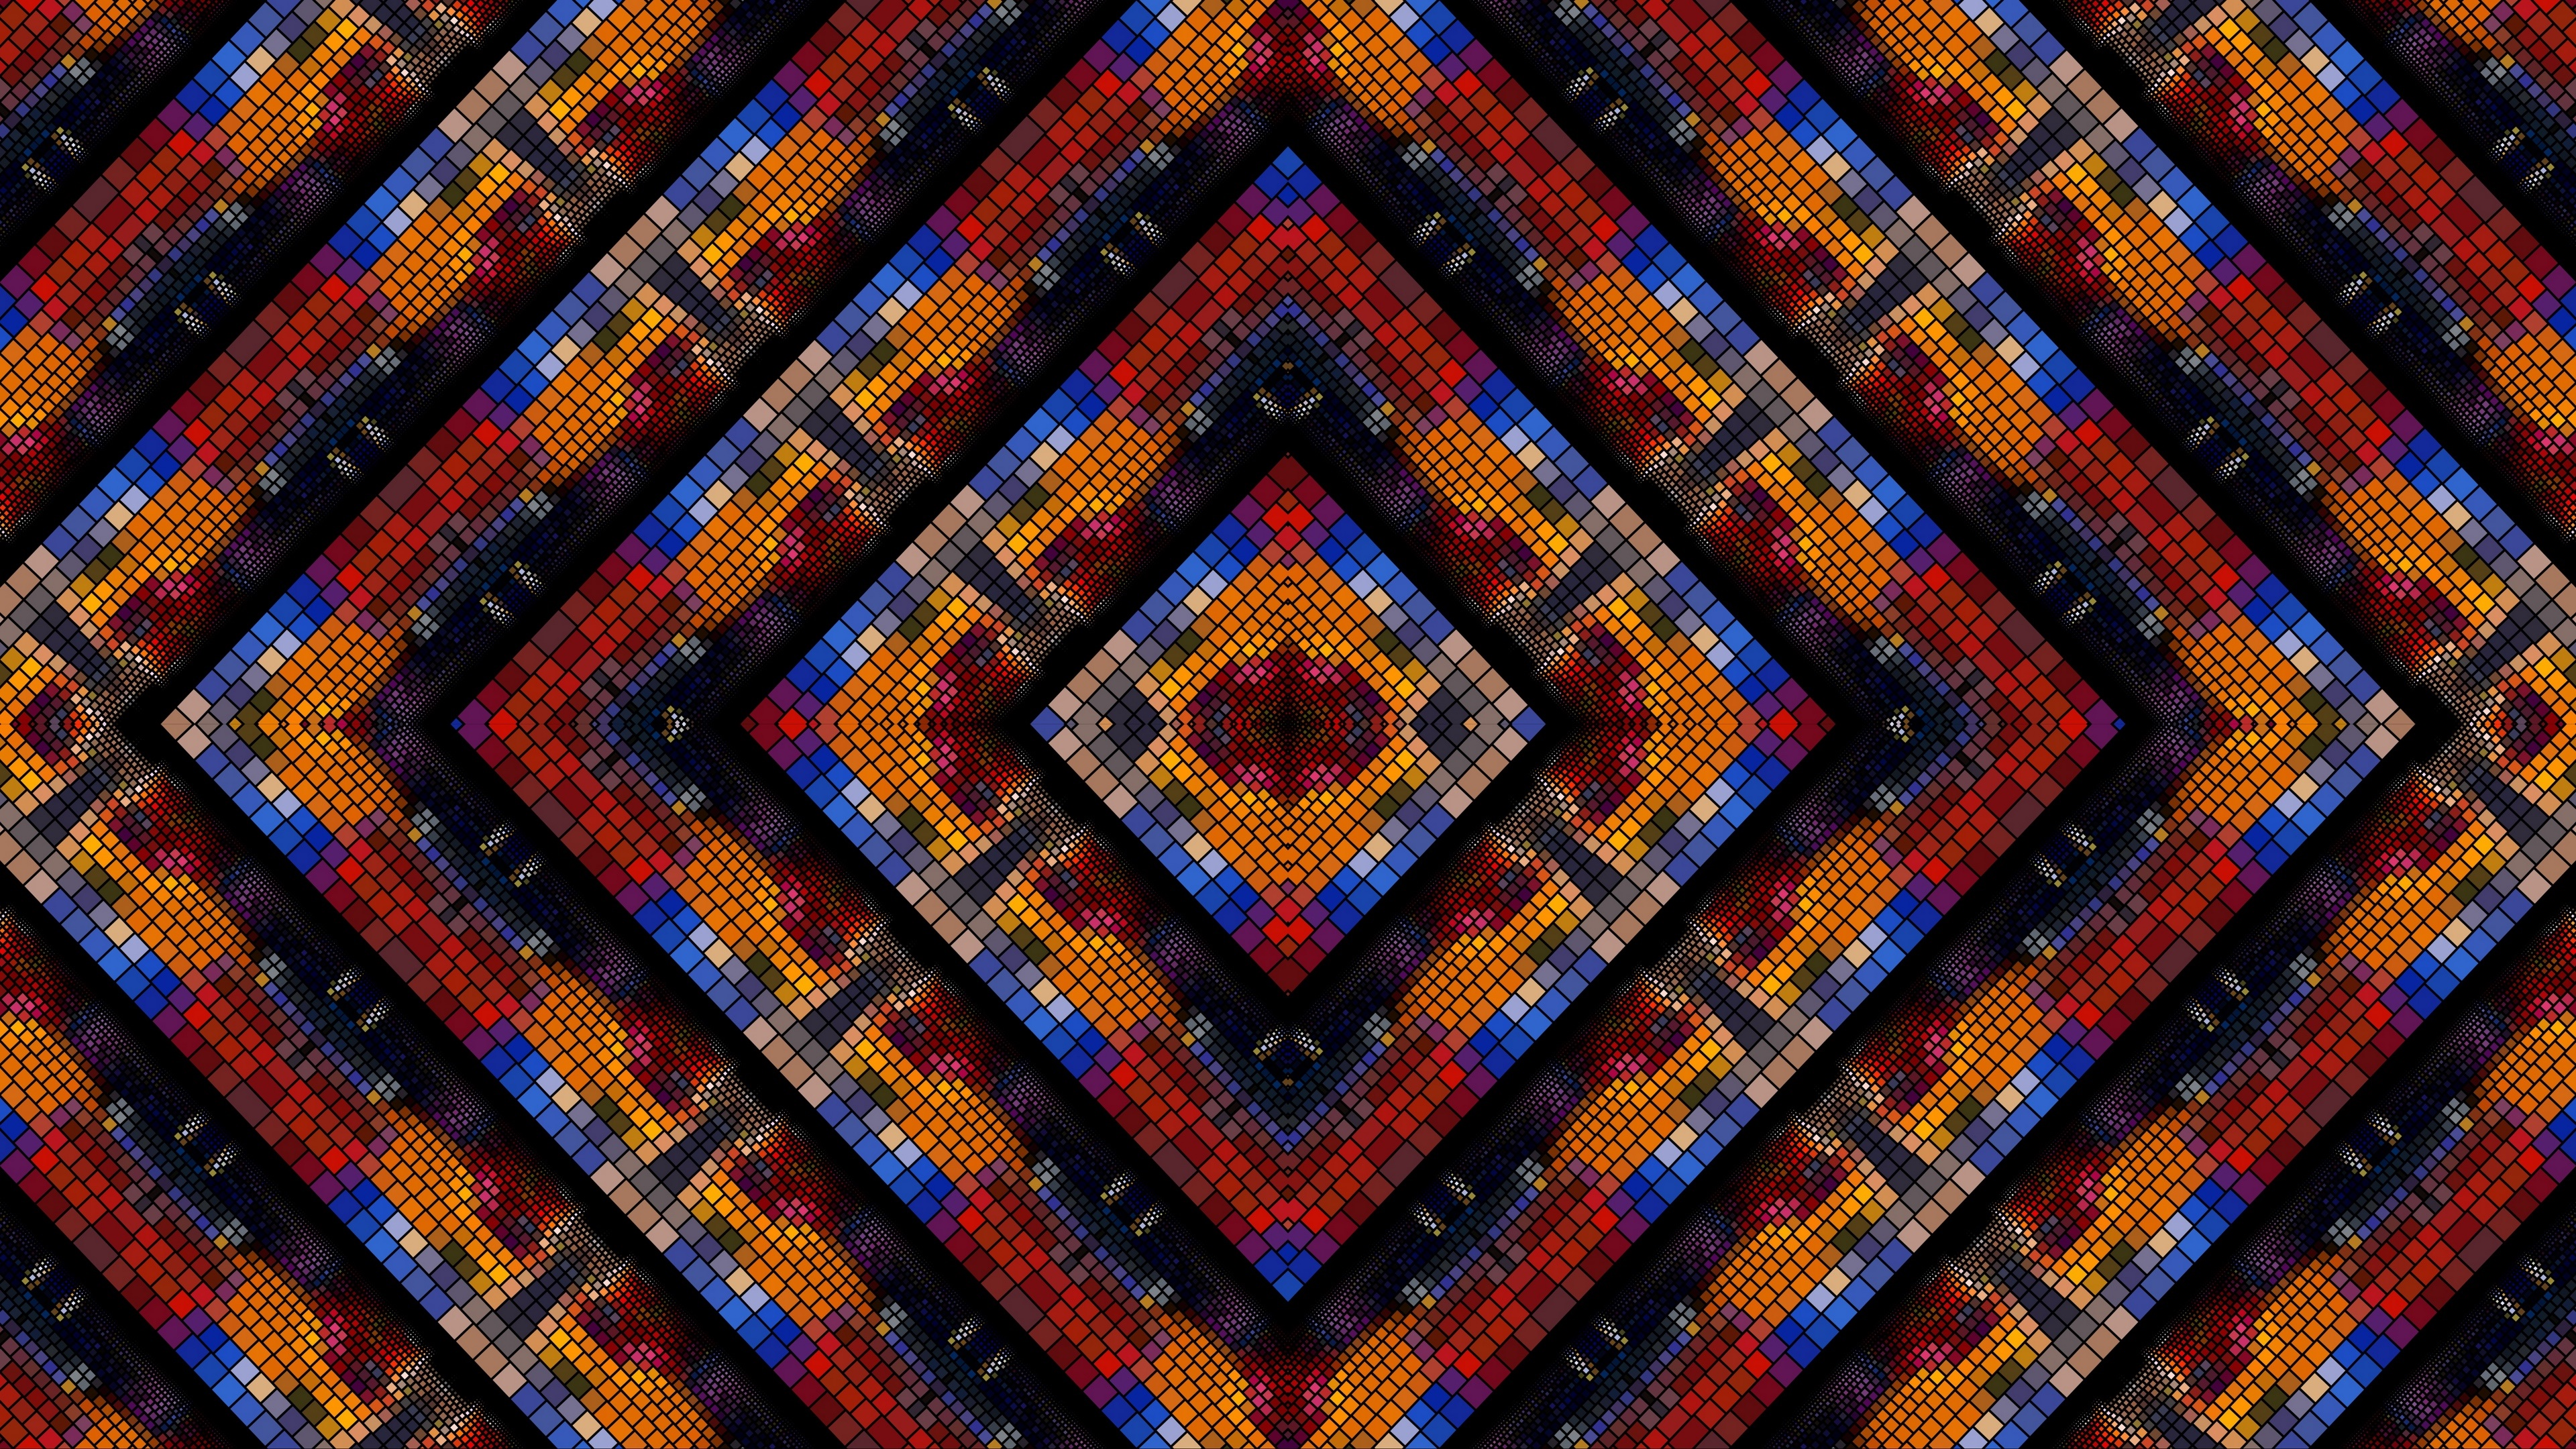 Kaleidoscope fractal wallpaper